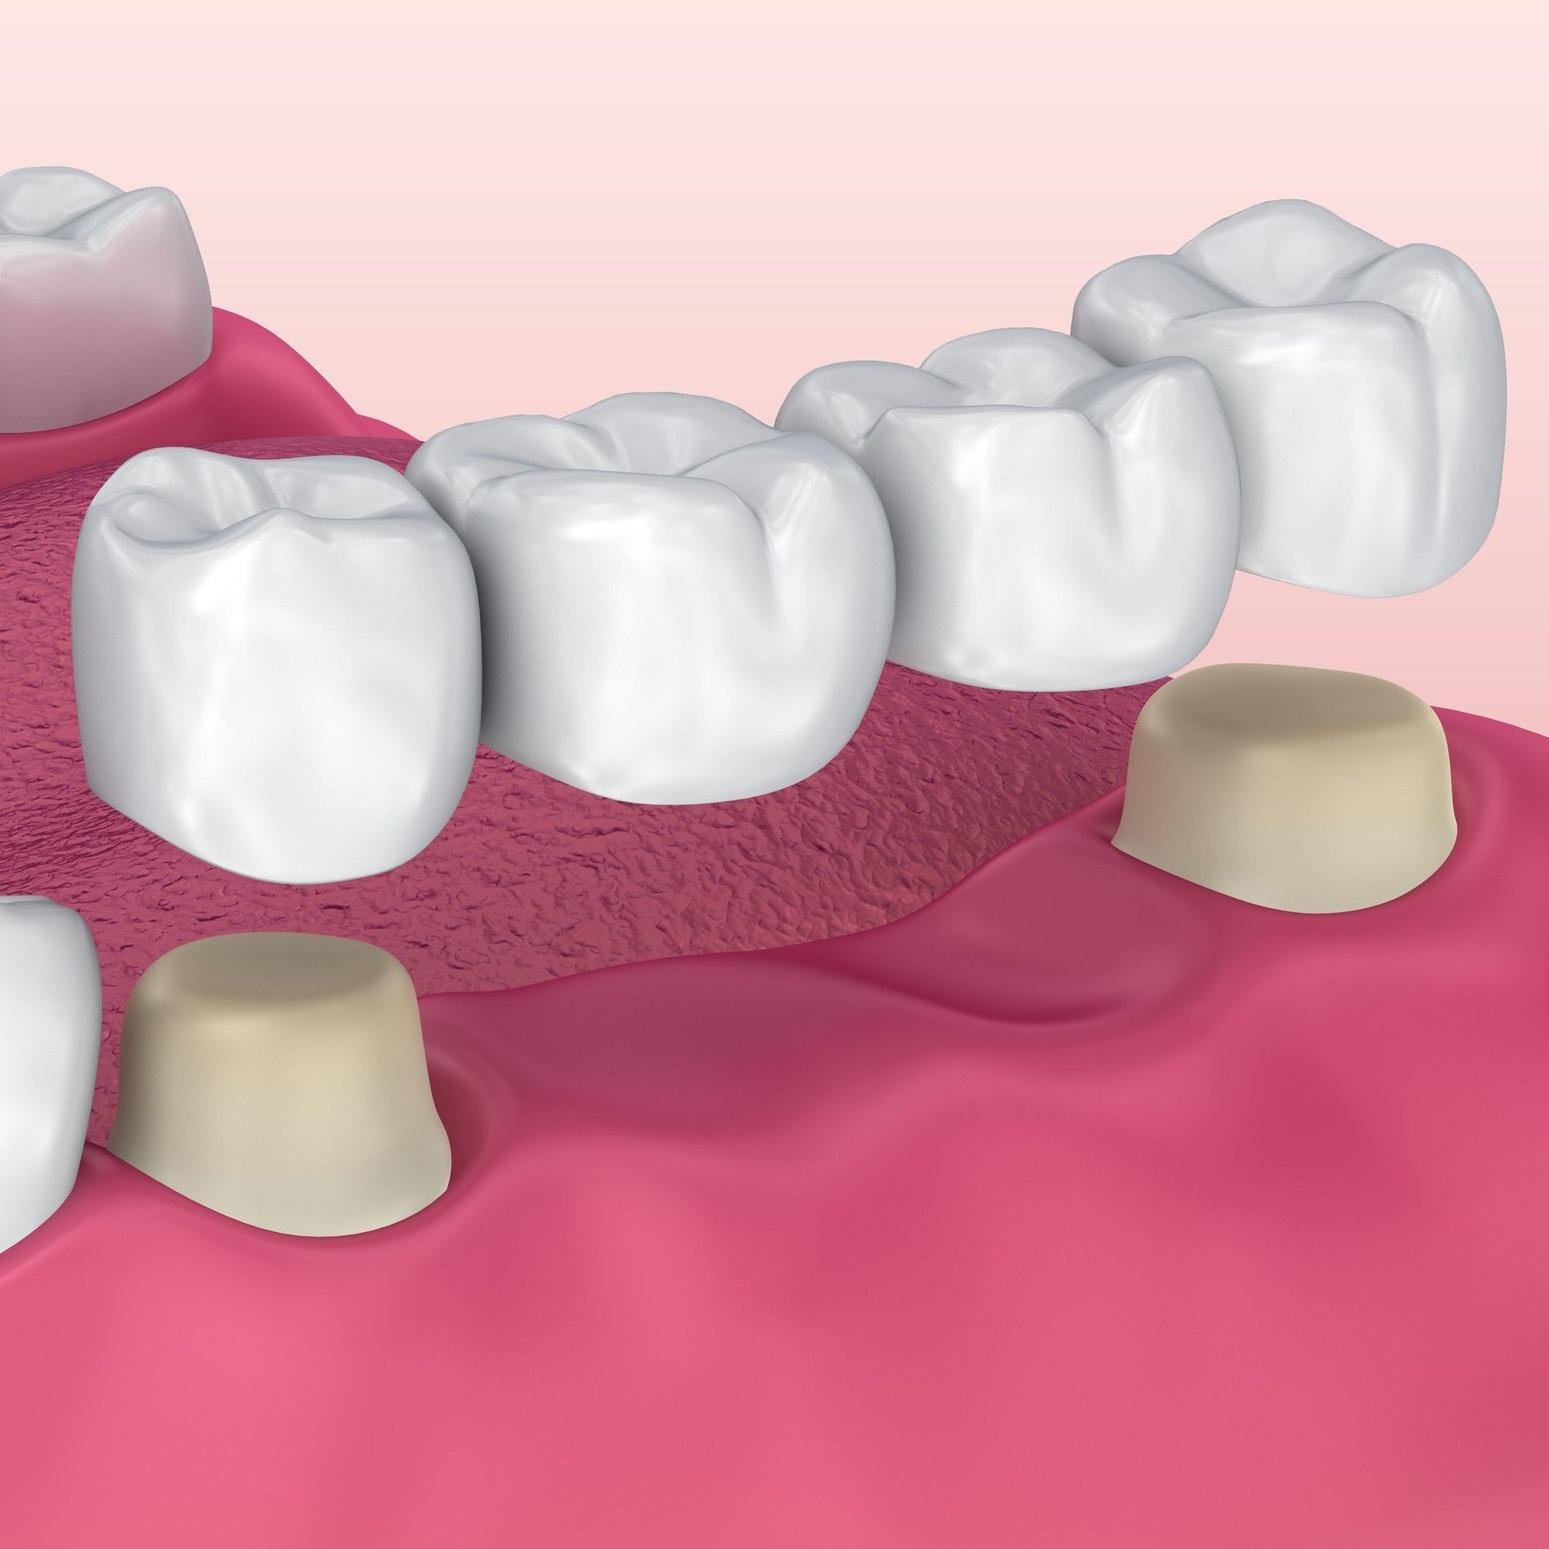 4 Unit Bridge (Crown Supported) - Dental Tourism Colombia